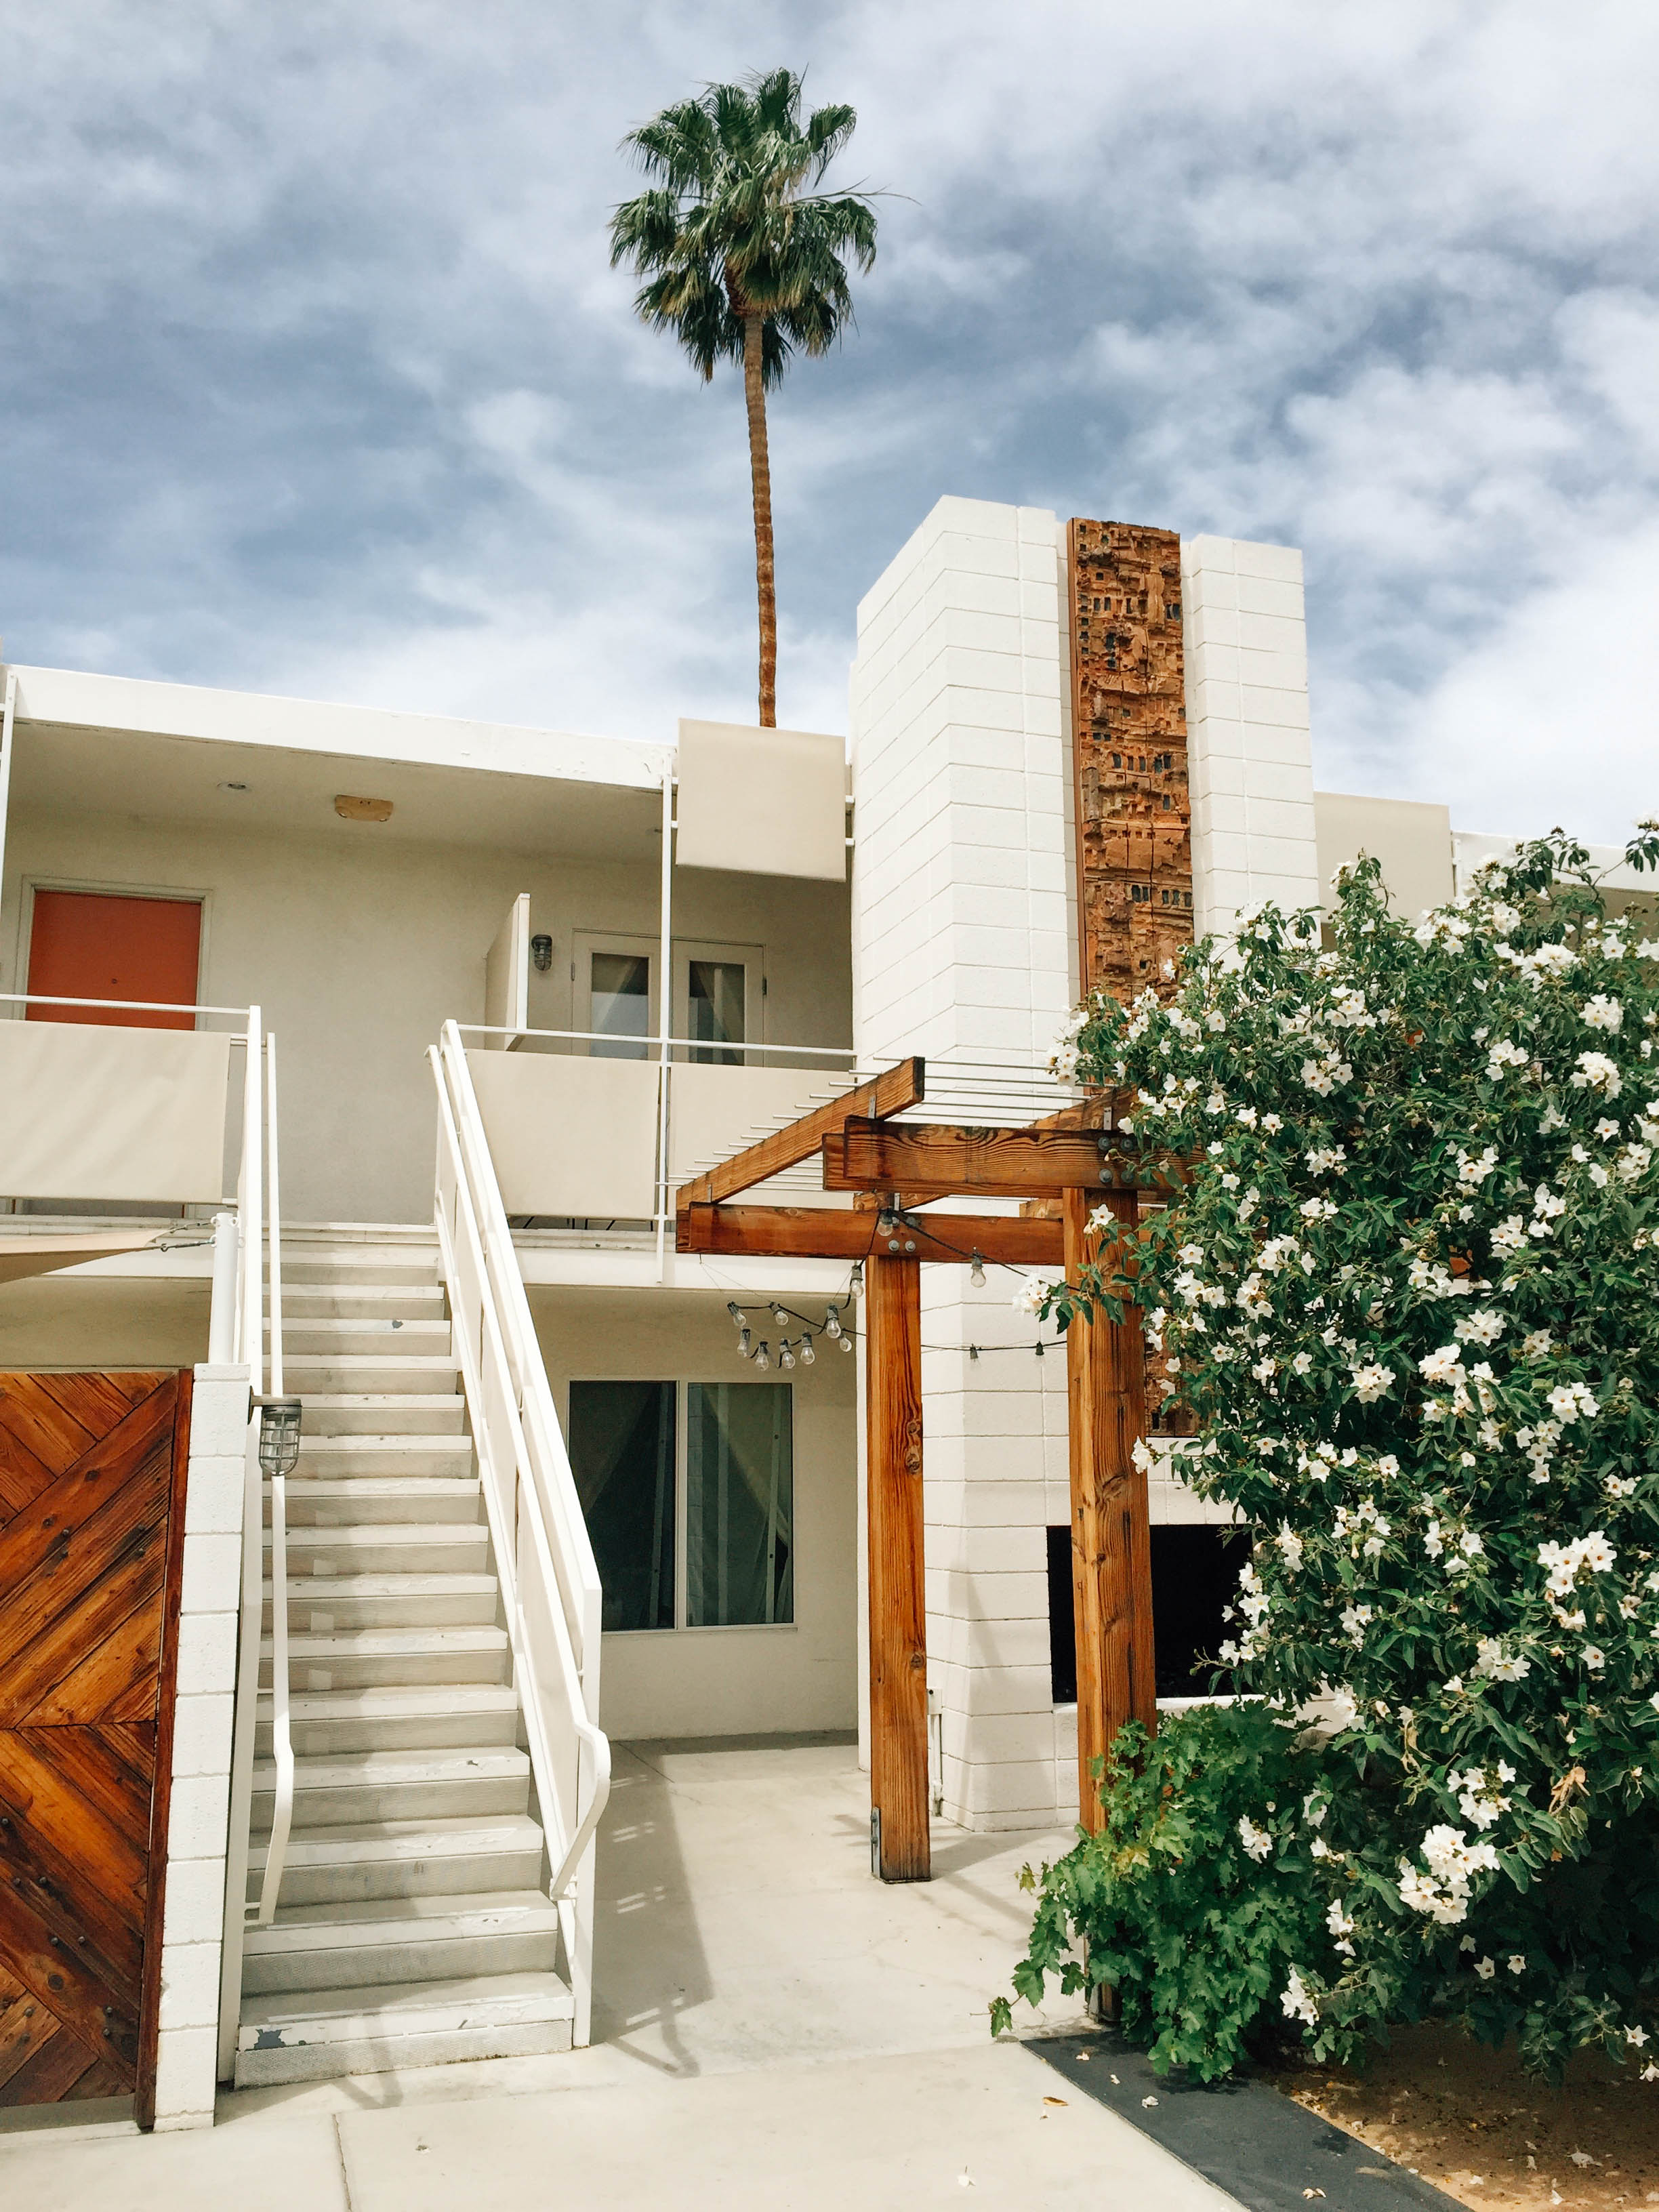 ACE hotel, Palm Springs, Coachella Accomodation